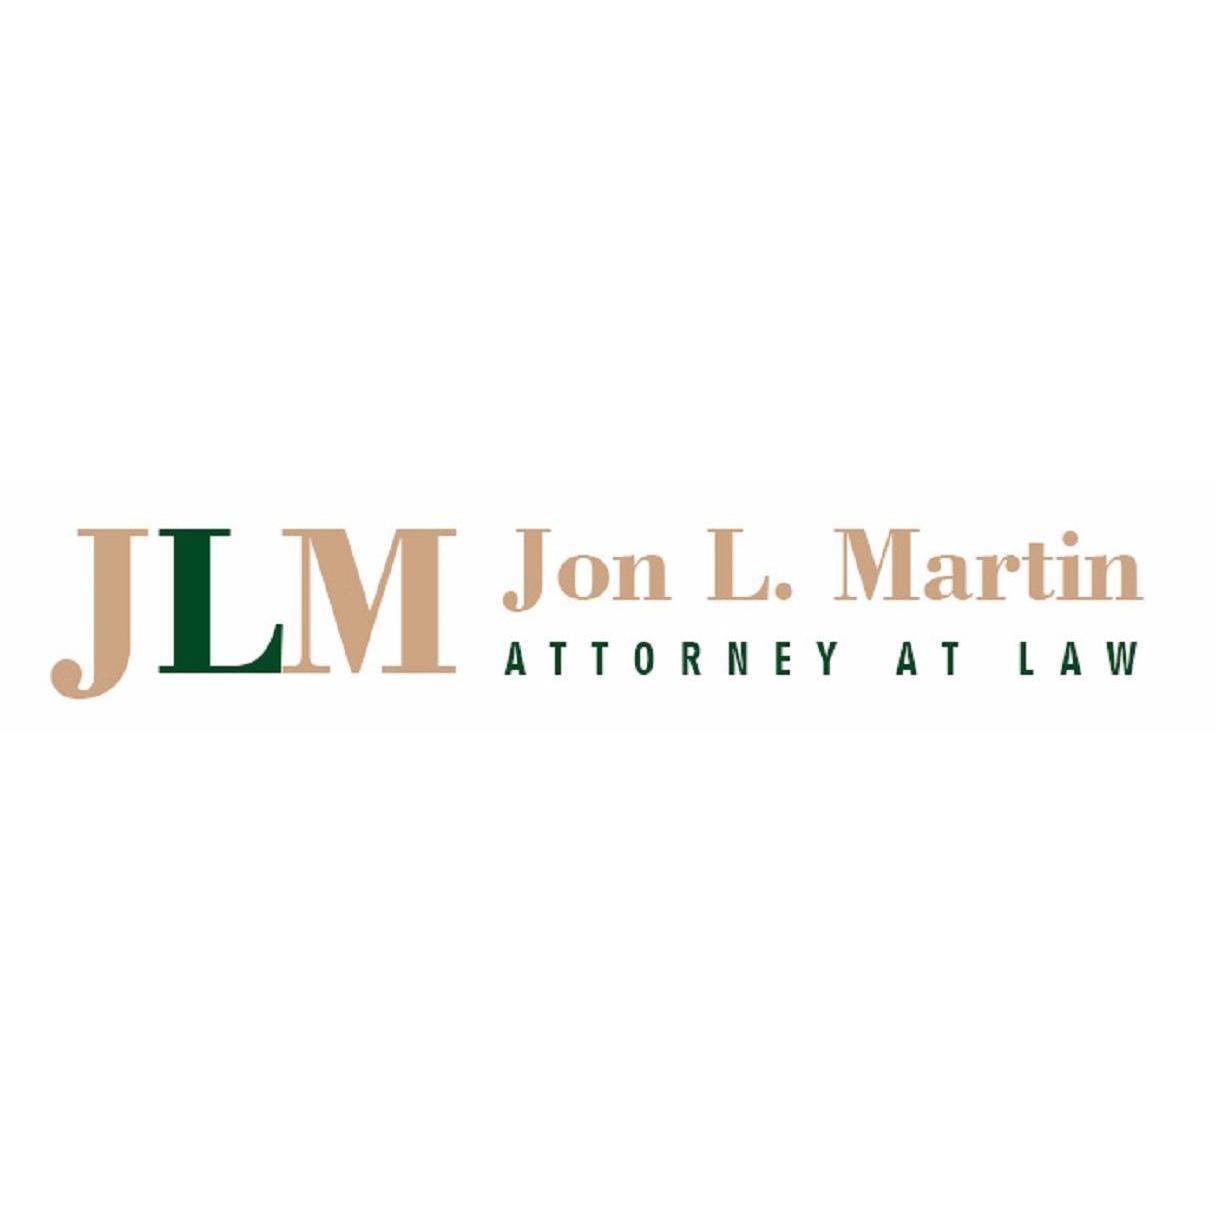 Jon L Martin - Palm City, FL 34990 - (772)419-9660 | ShowMeLocal.com